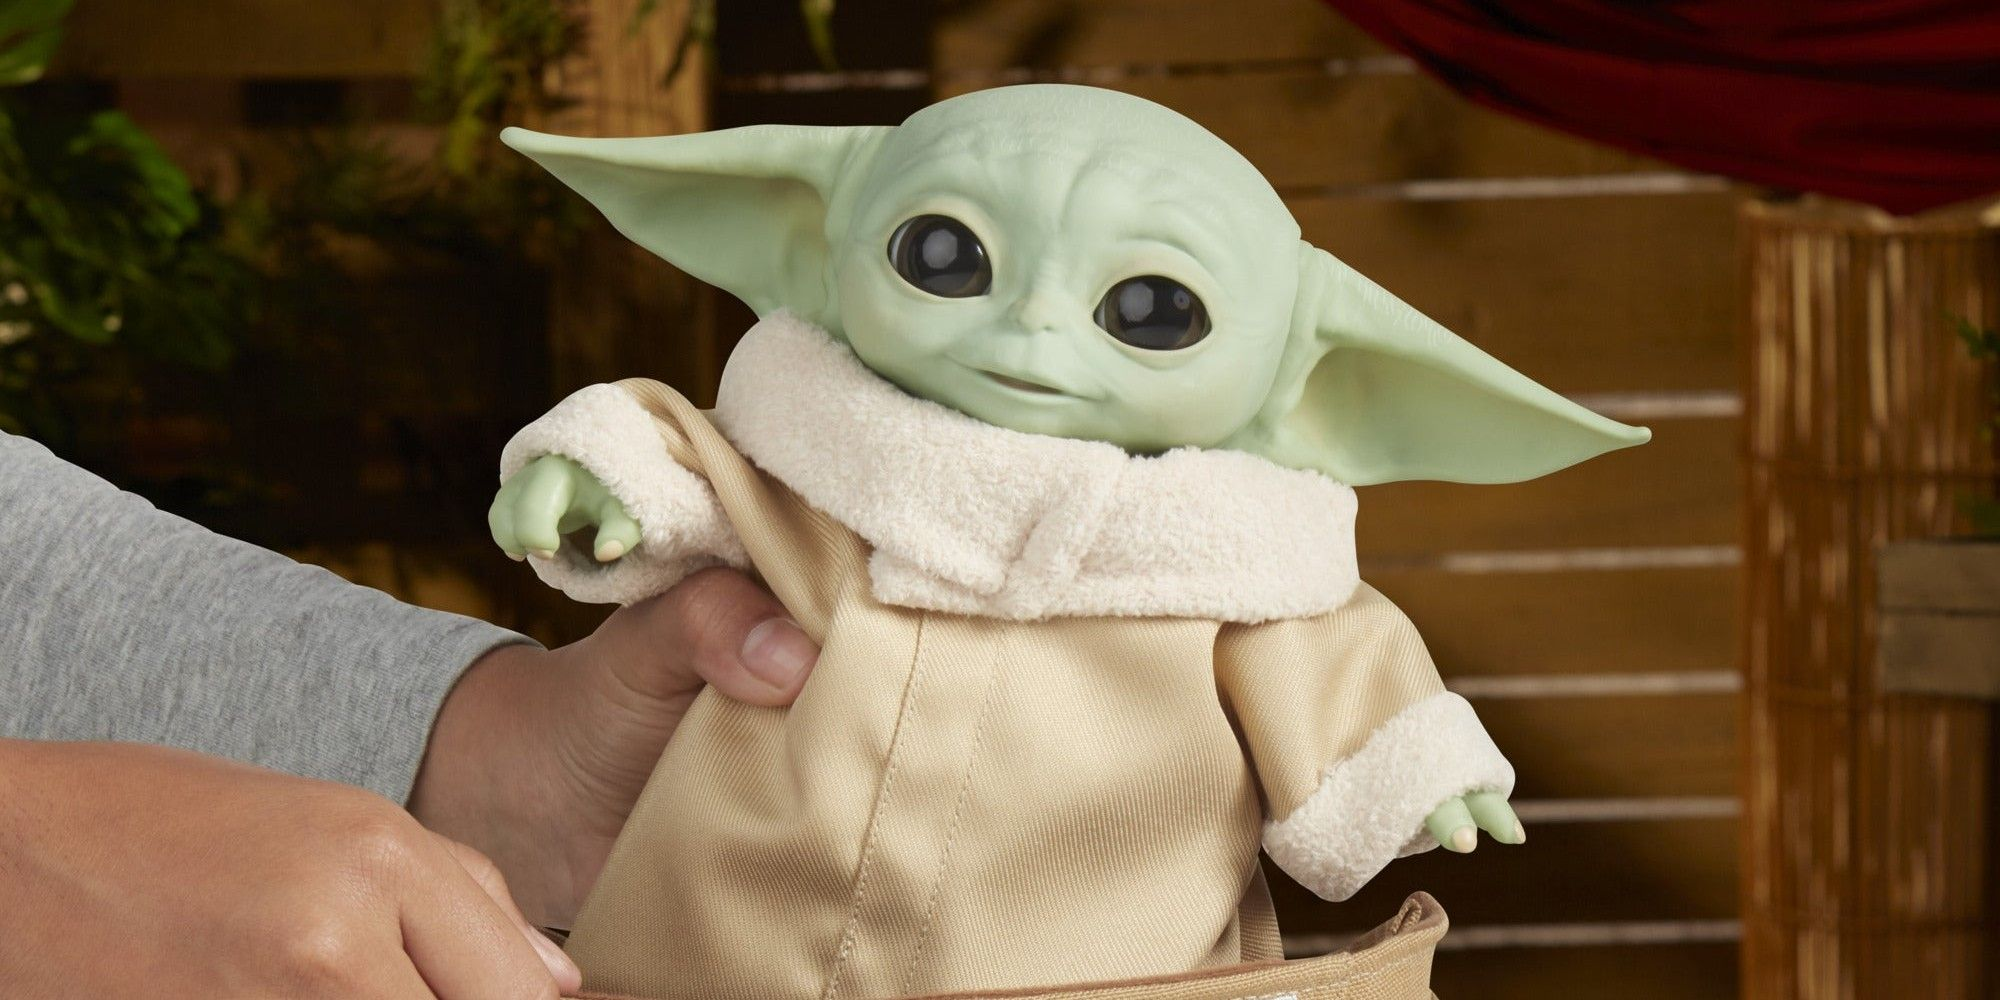 New Star Wars The Mandalorian The Child Baby Yoda Animatronic Edition Brand New!